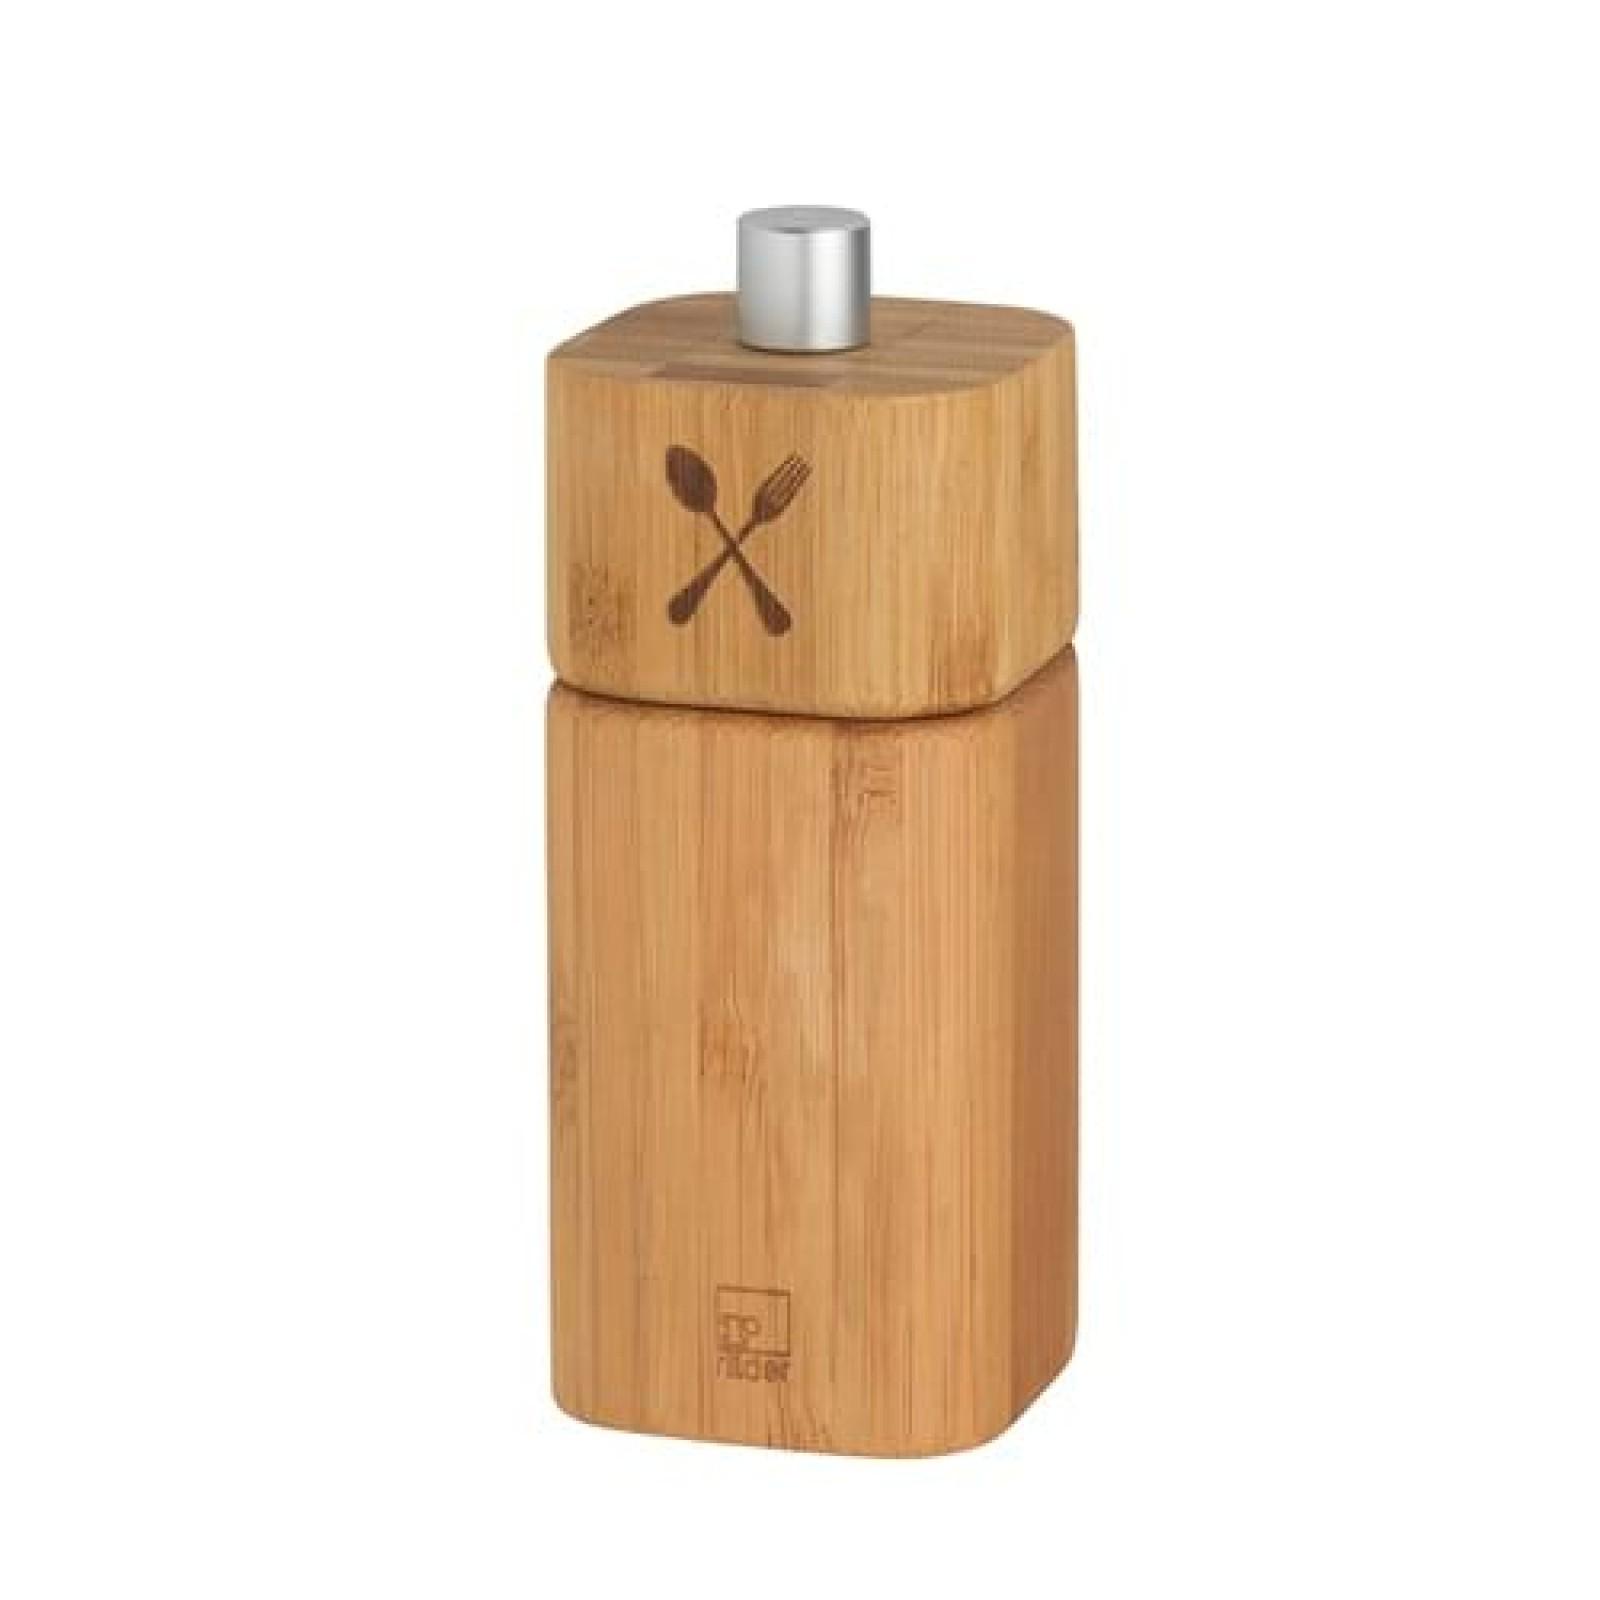 CUTLERY Salt Mill (Bamboo) - Raeder